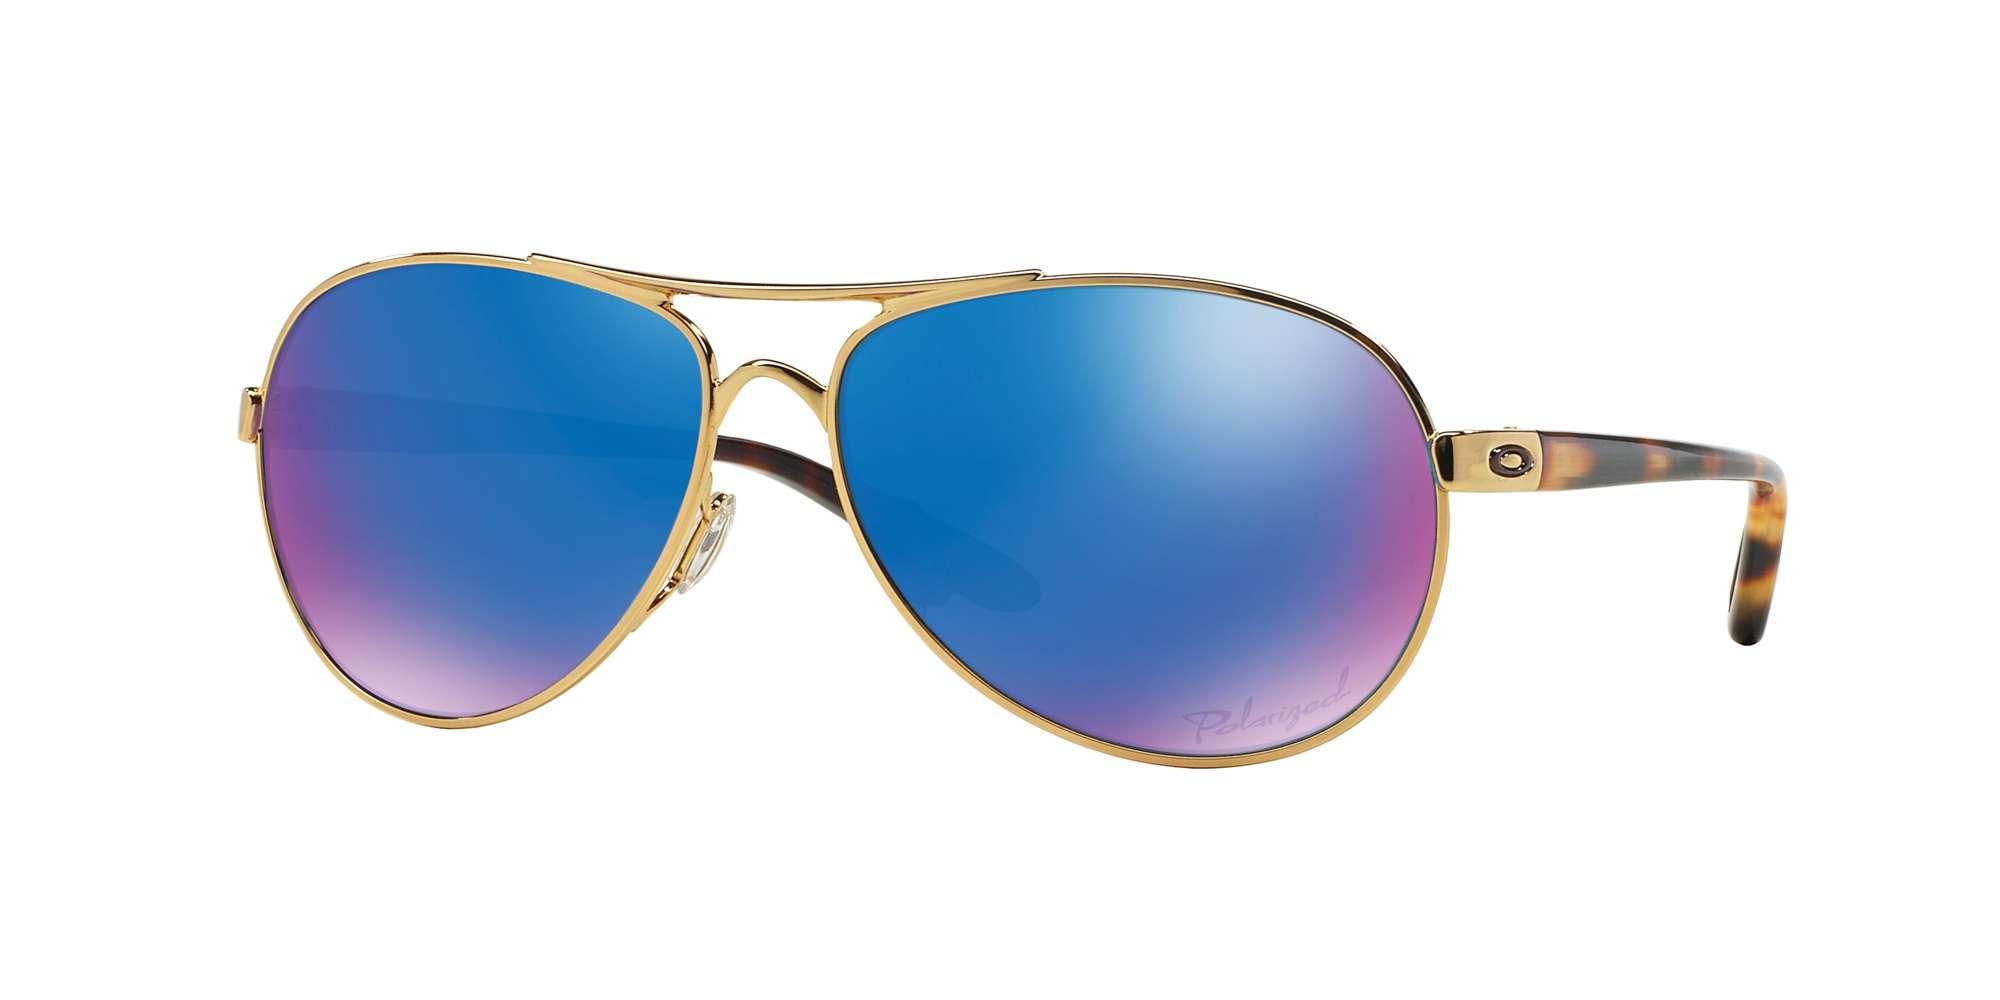 POLISHED GOLD / SAPPHIRE IRID POLAR lenses